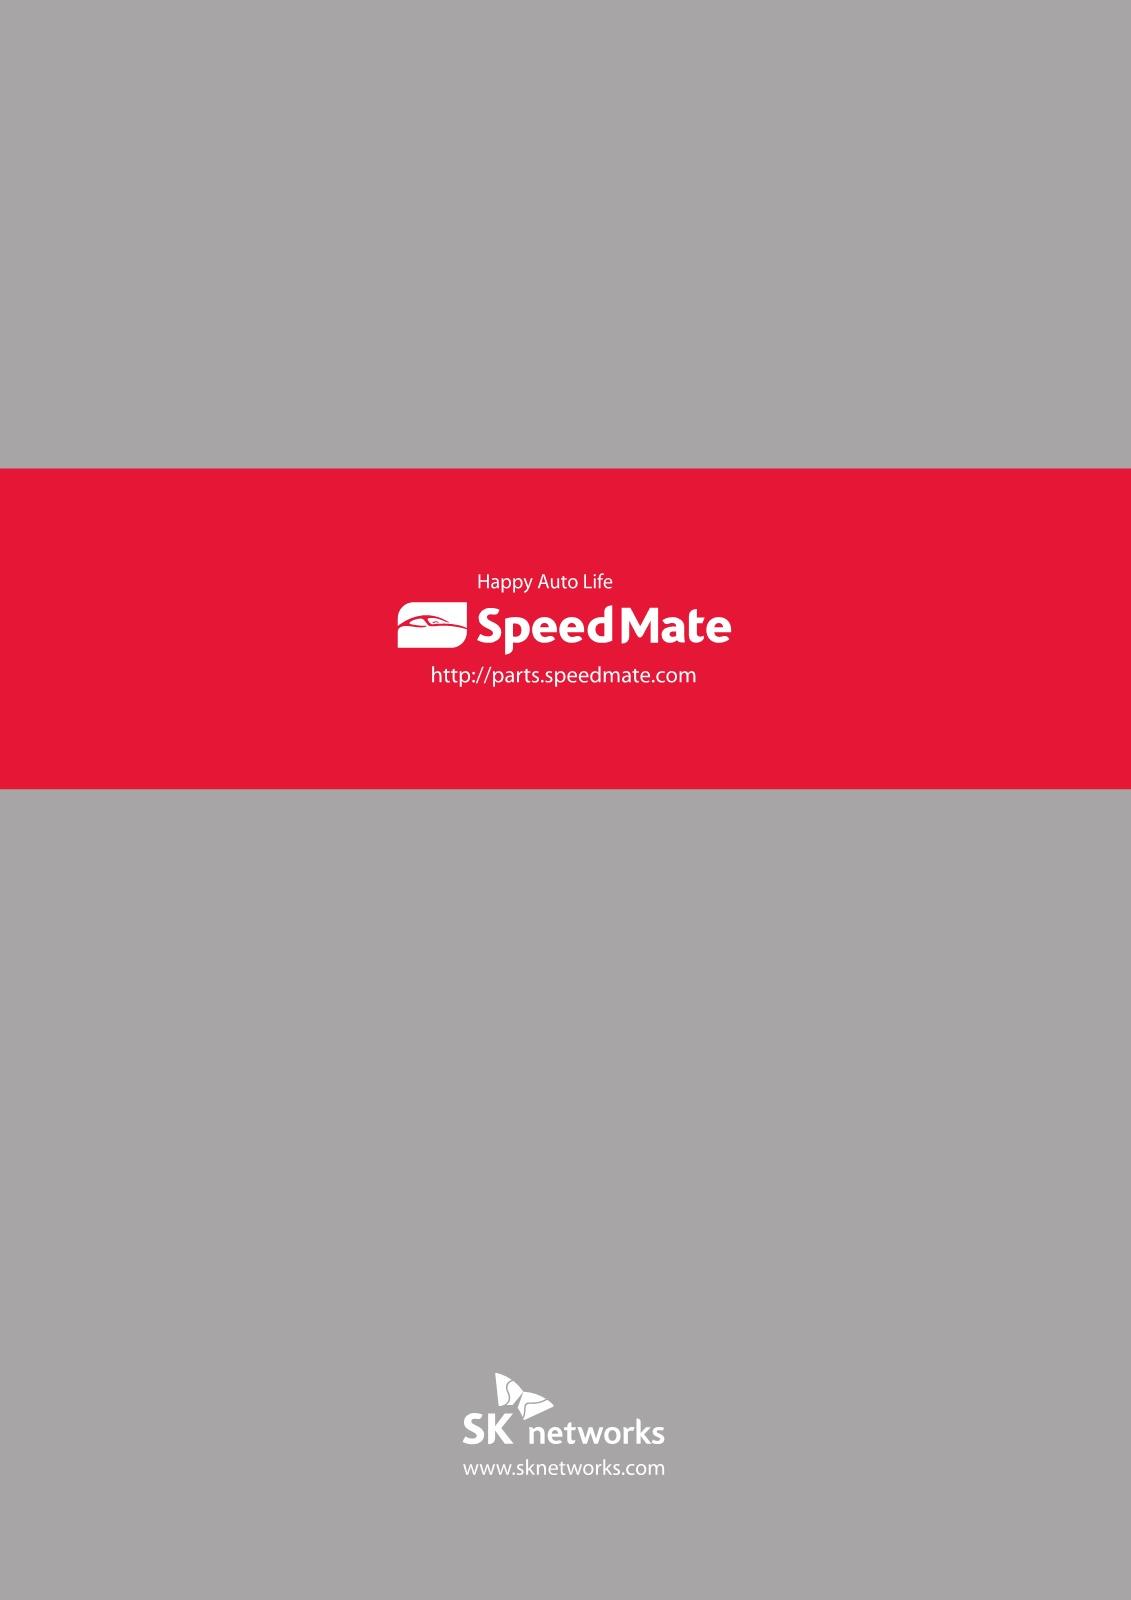 SPEEDMATE-4.jpg